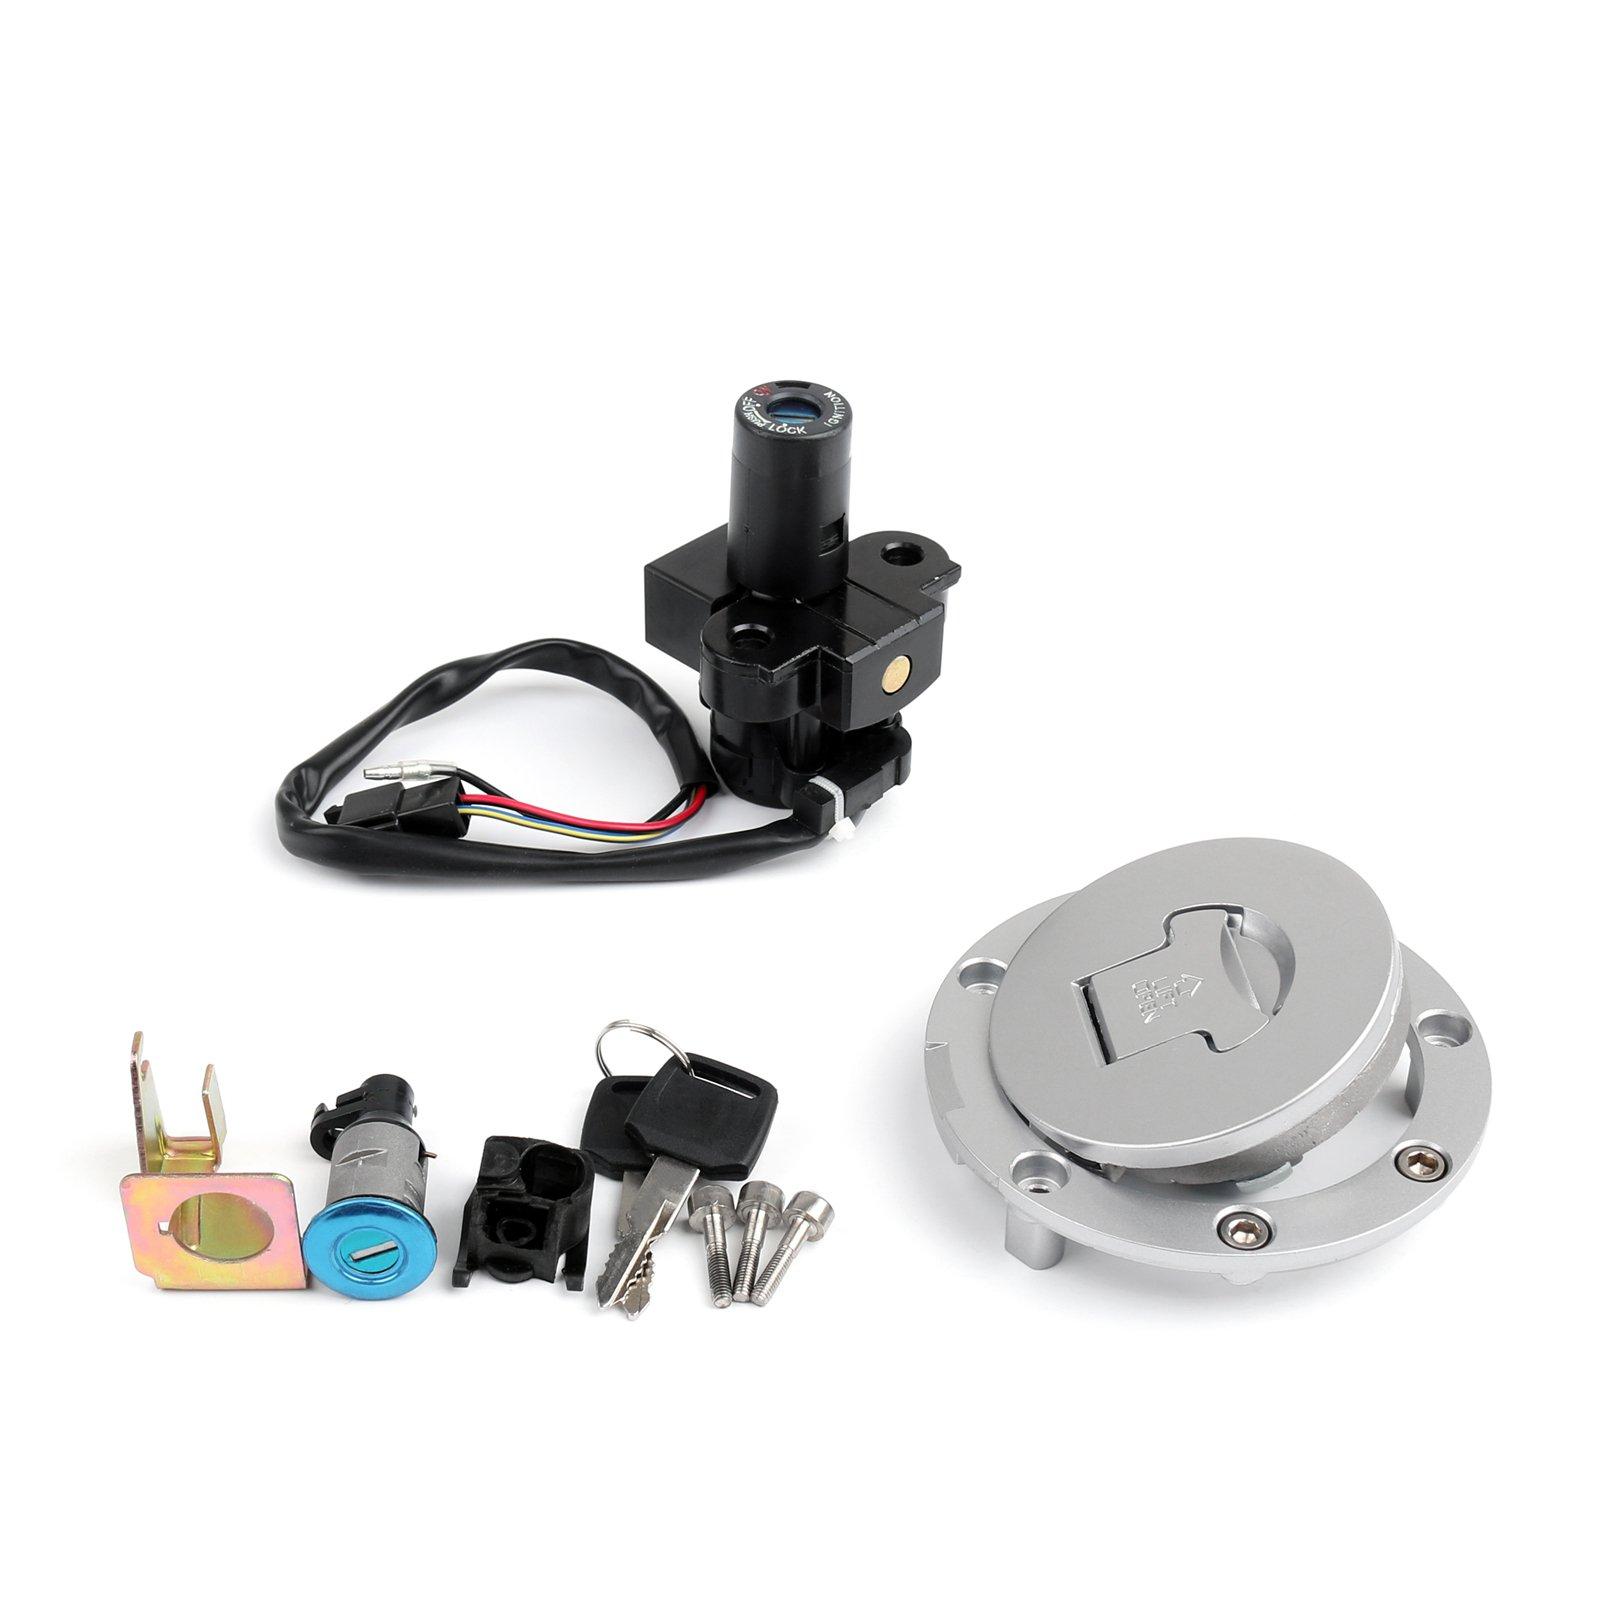 Areyourshop Ignition Switch Lock & Fuel Gas Cap Key Set For Honda CBR1100XX 1996-1998 1997